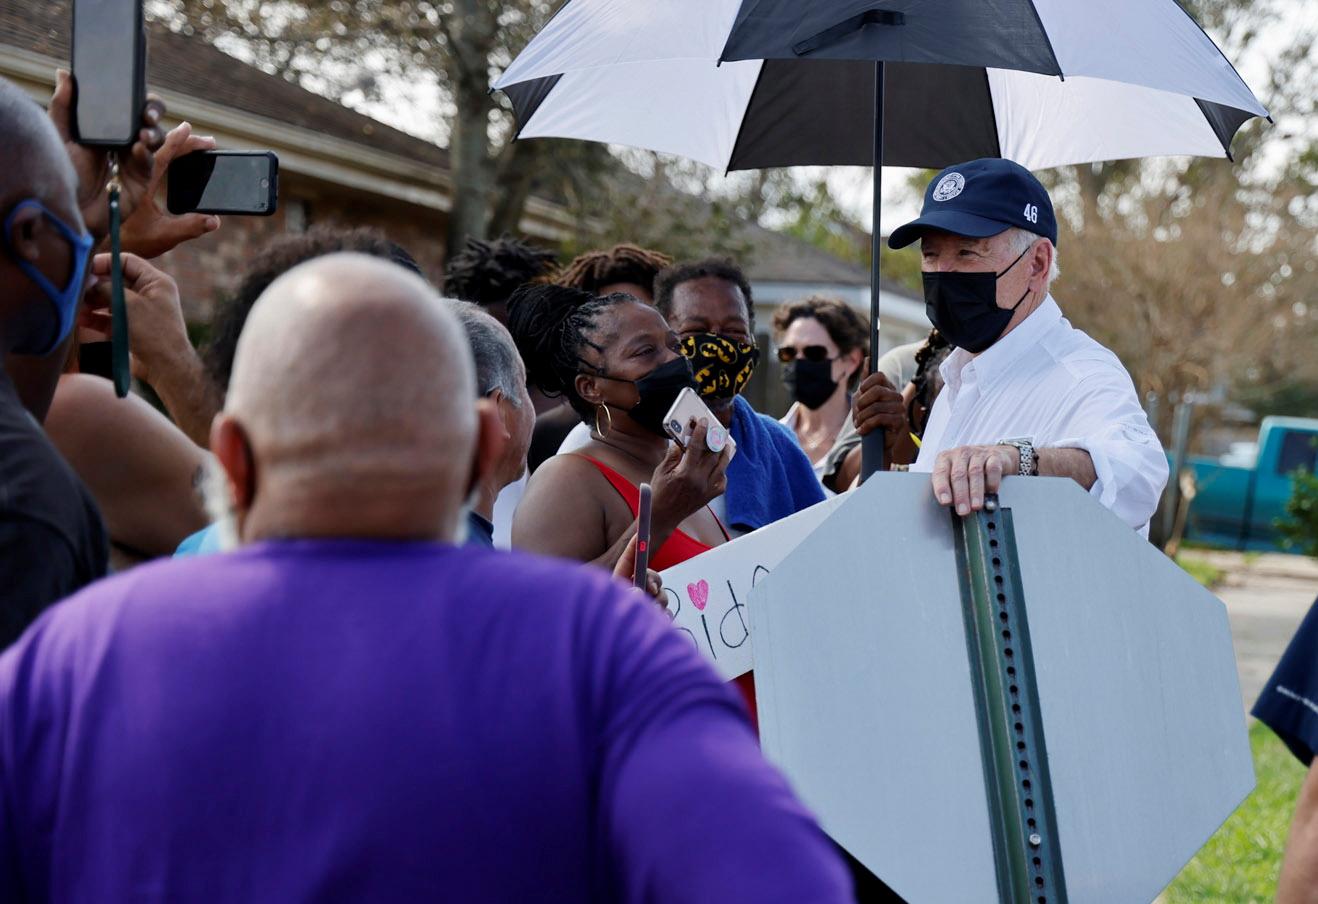 U.S. President Joe Biden talks to residents as he tours a neighbourhood hit by Hurricane Ida in LaPlace, Louisiana, U.S. September 3, 2021. REUTERS/Jonathan Ernst